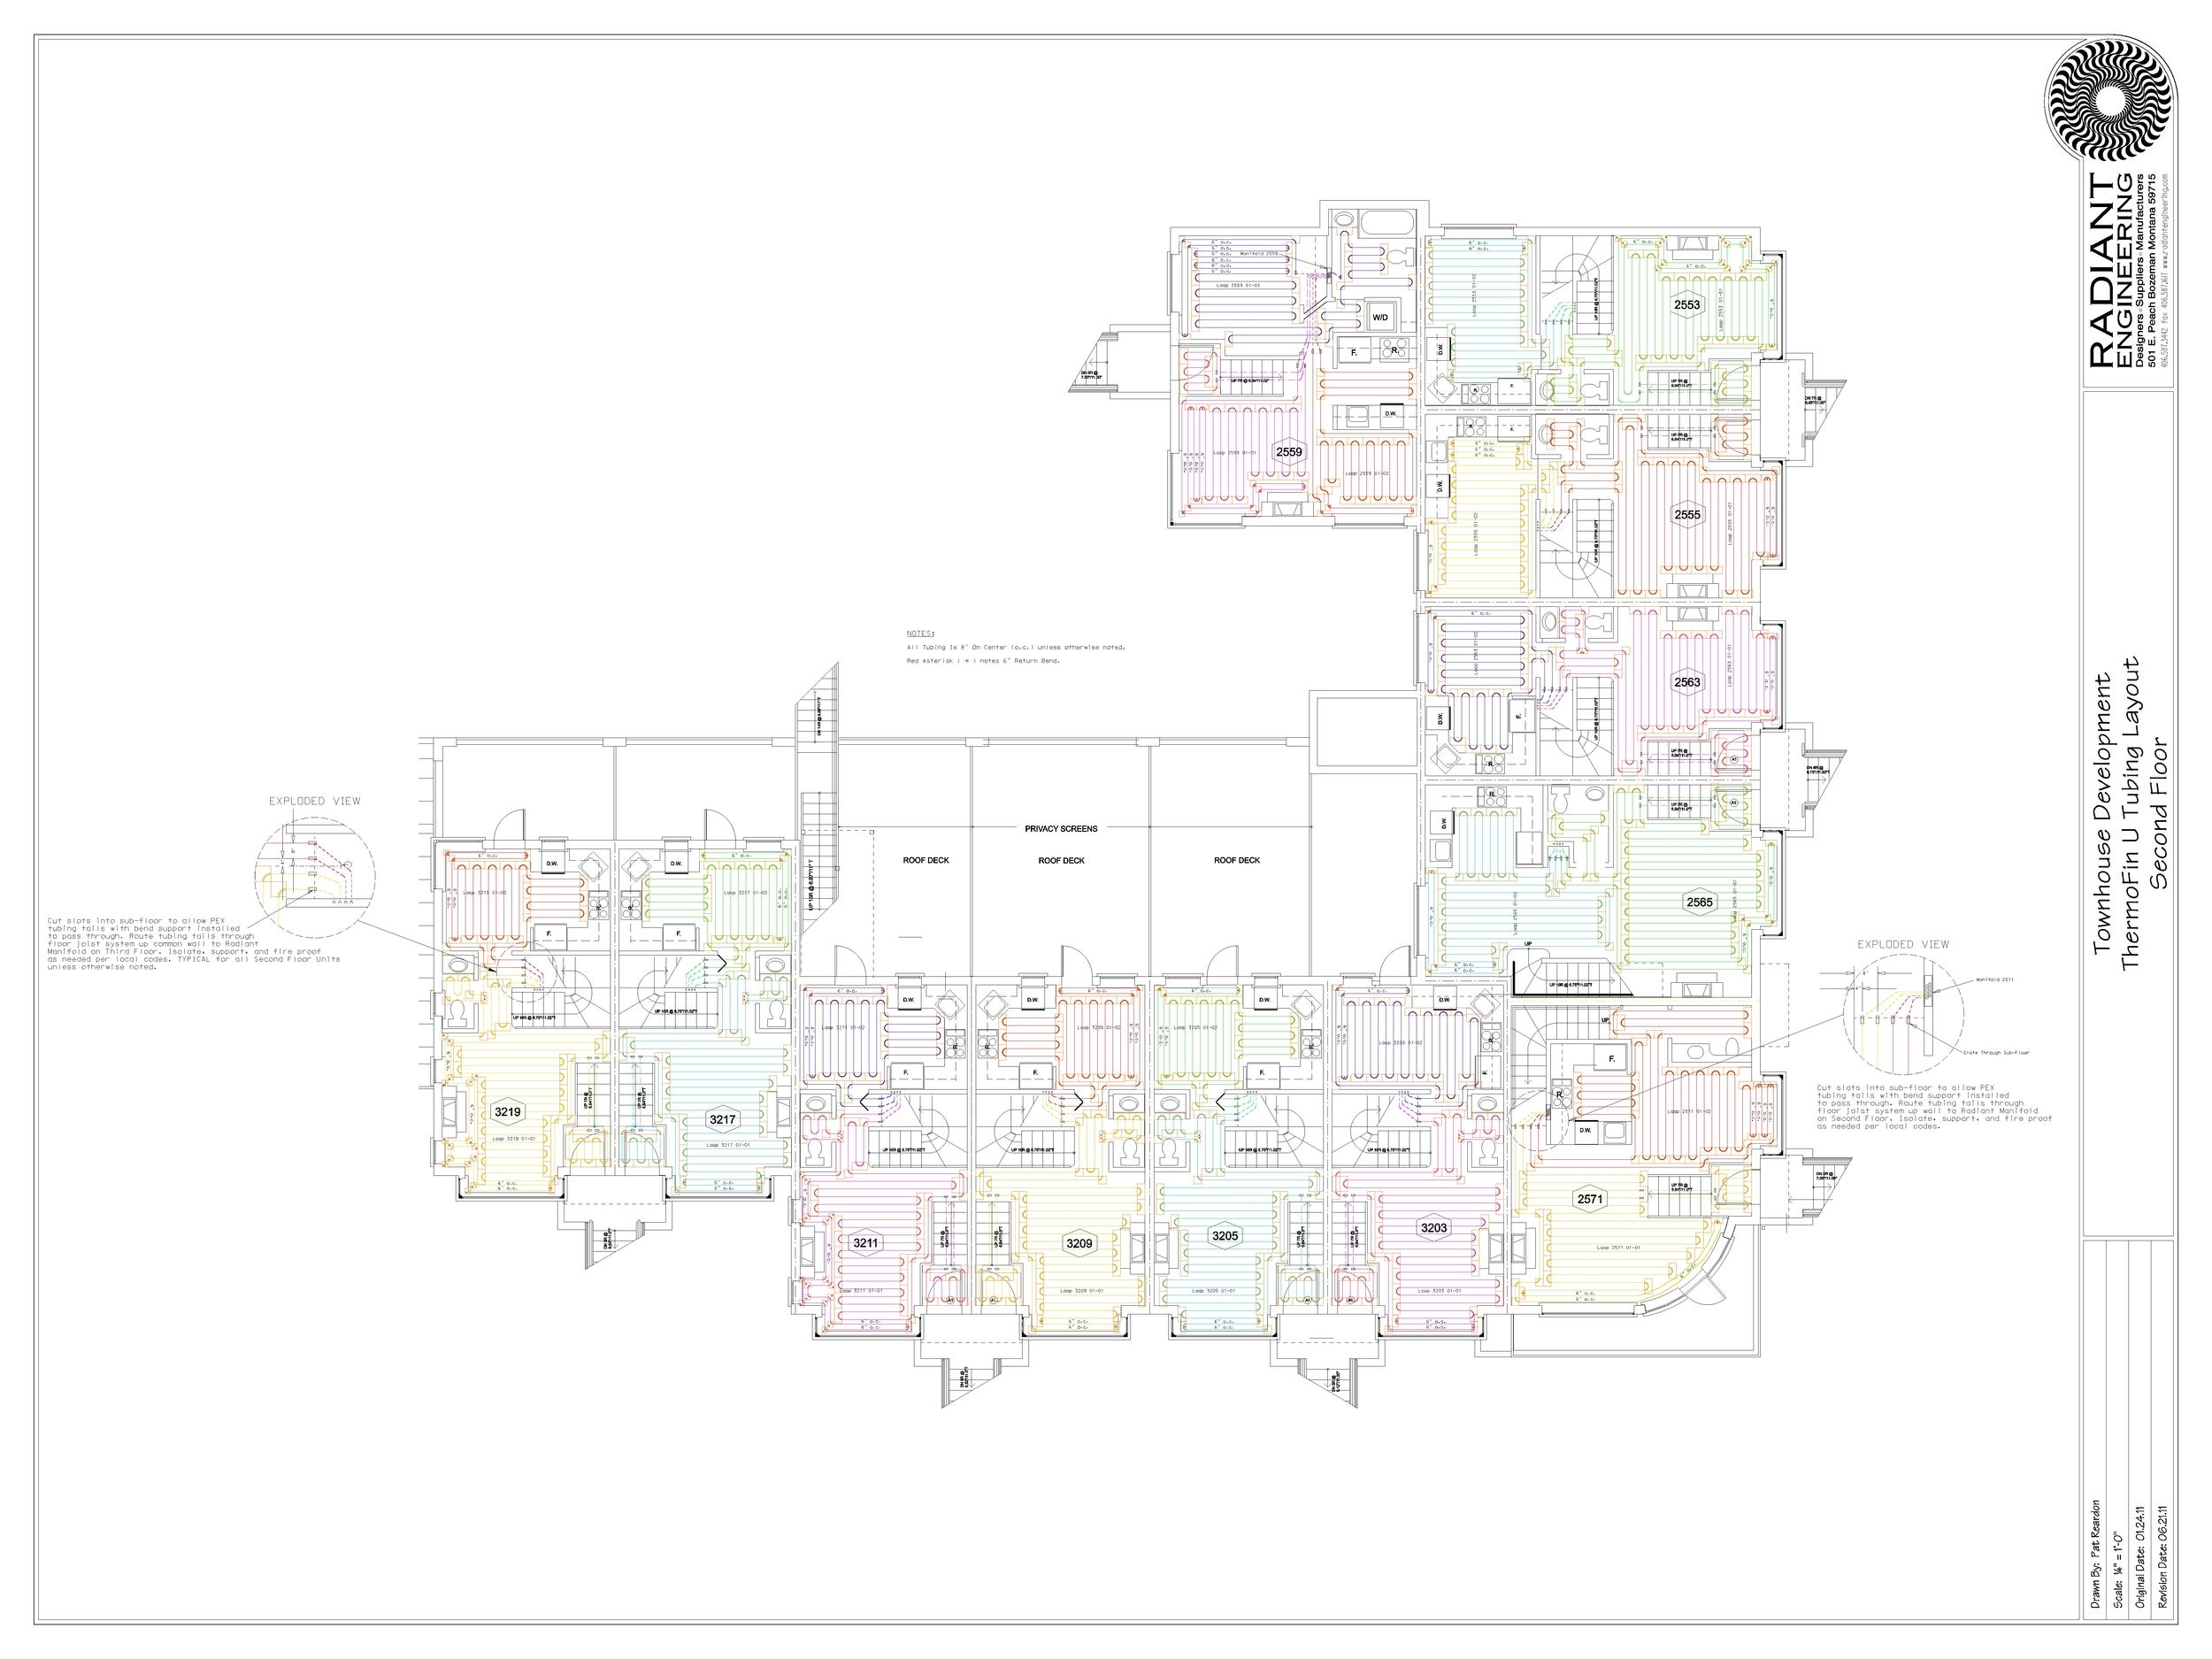 Townhouse Development Level 2